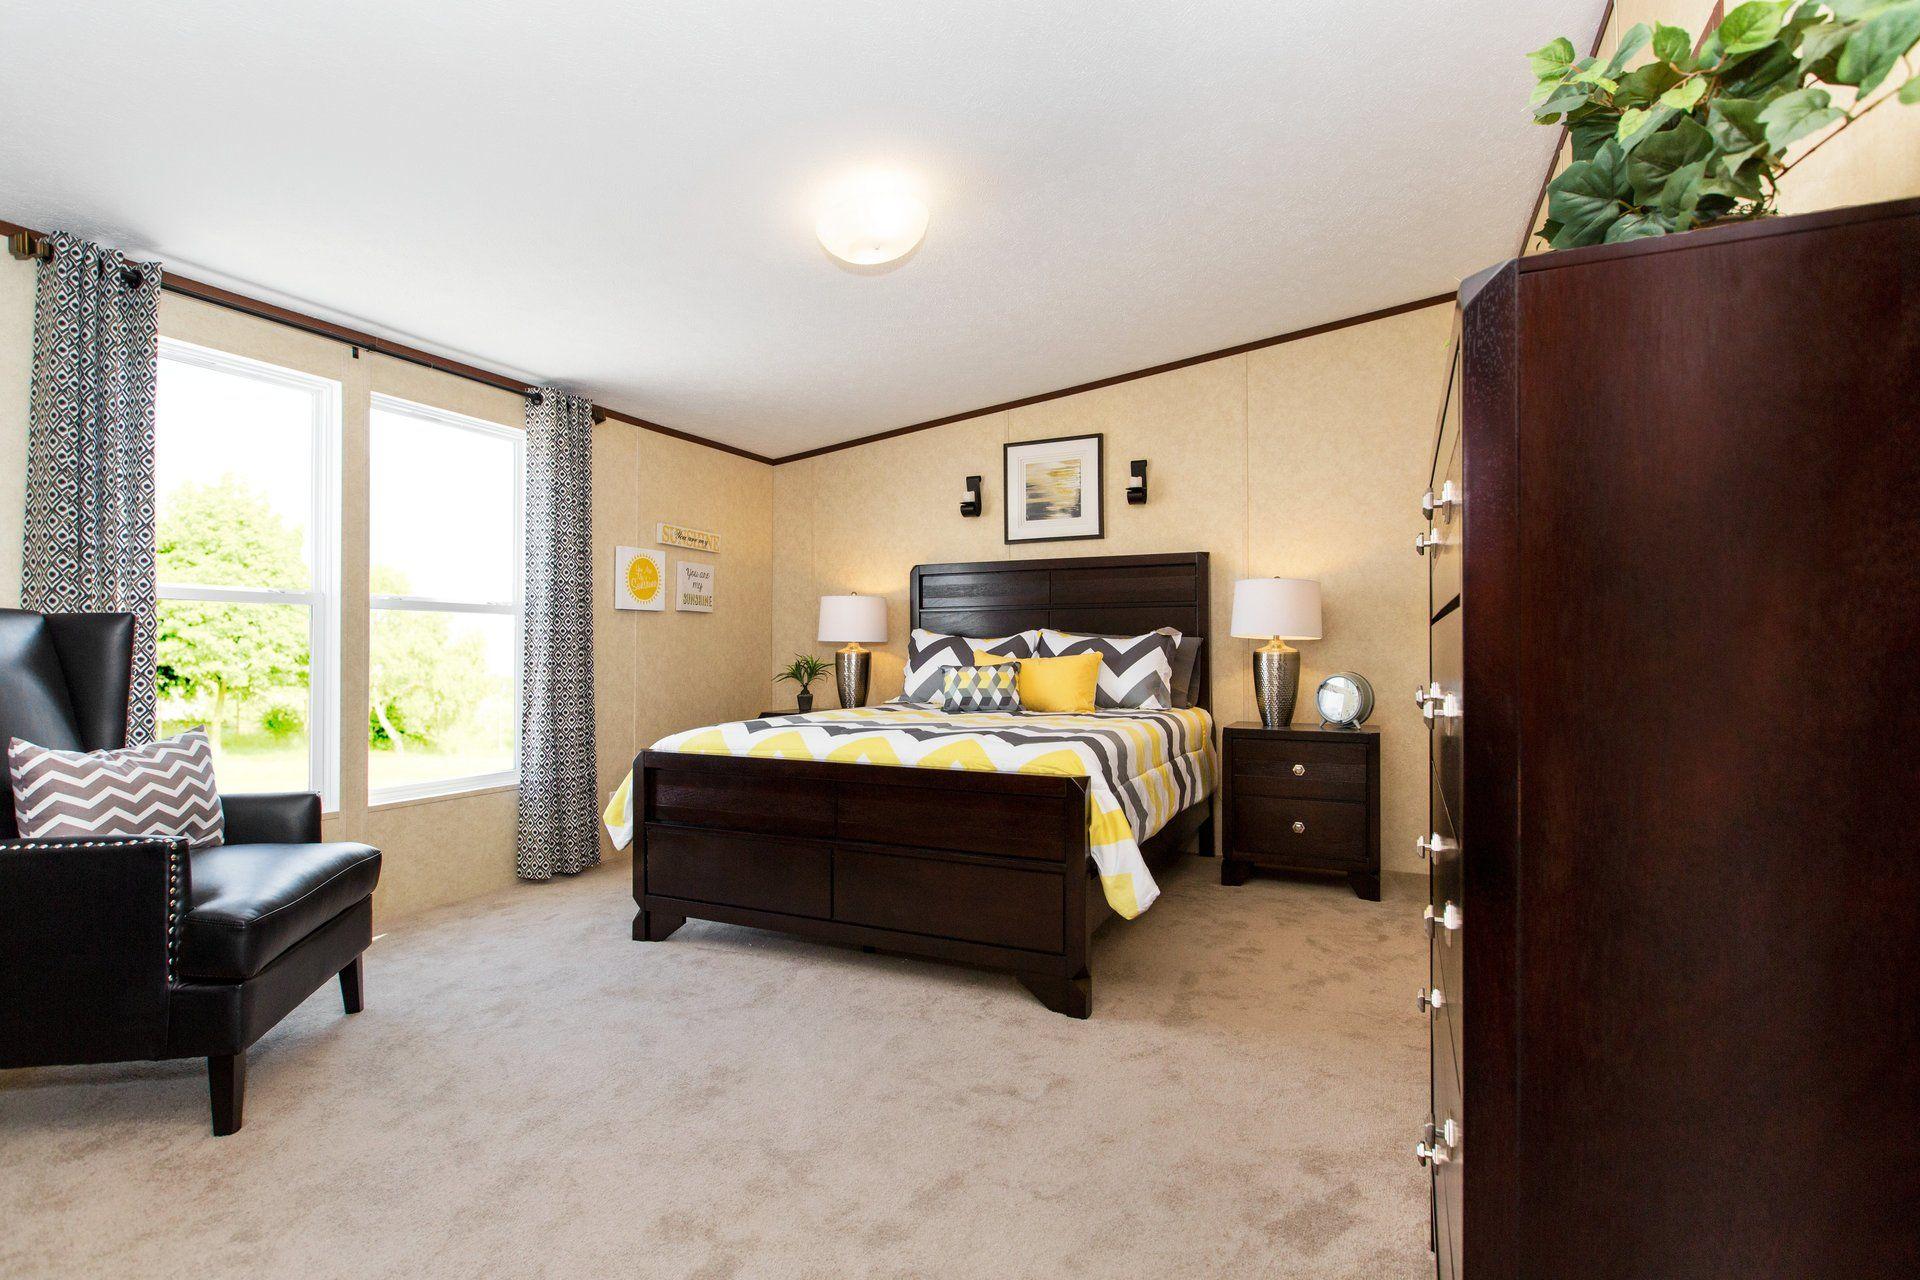 3 bedroom greensboro nc